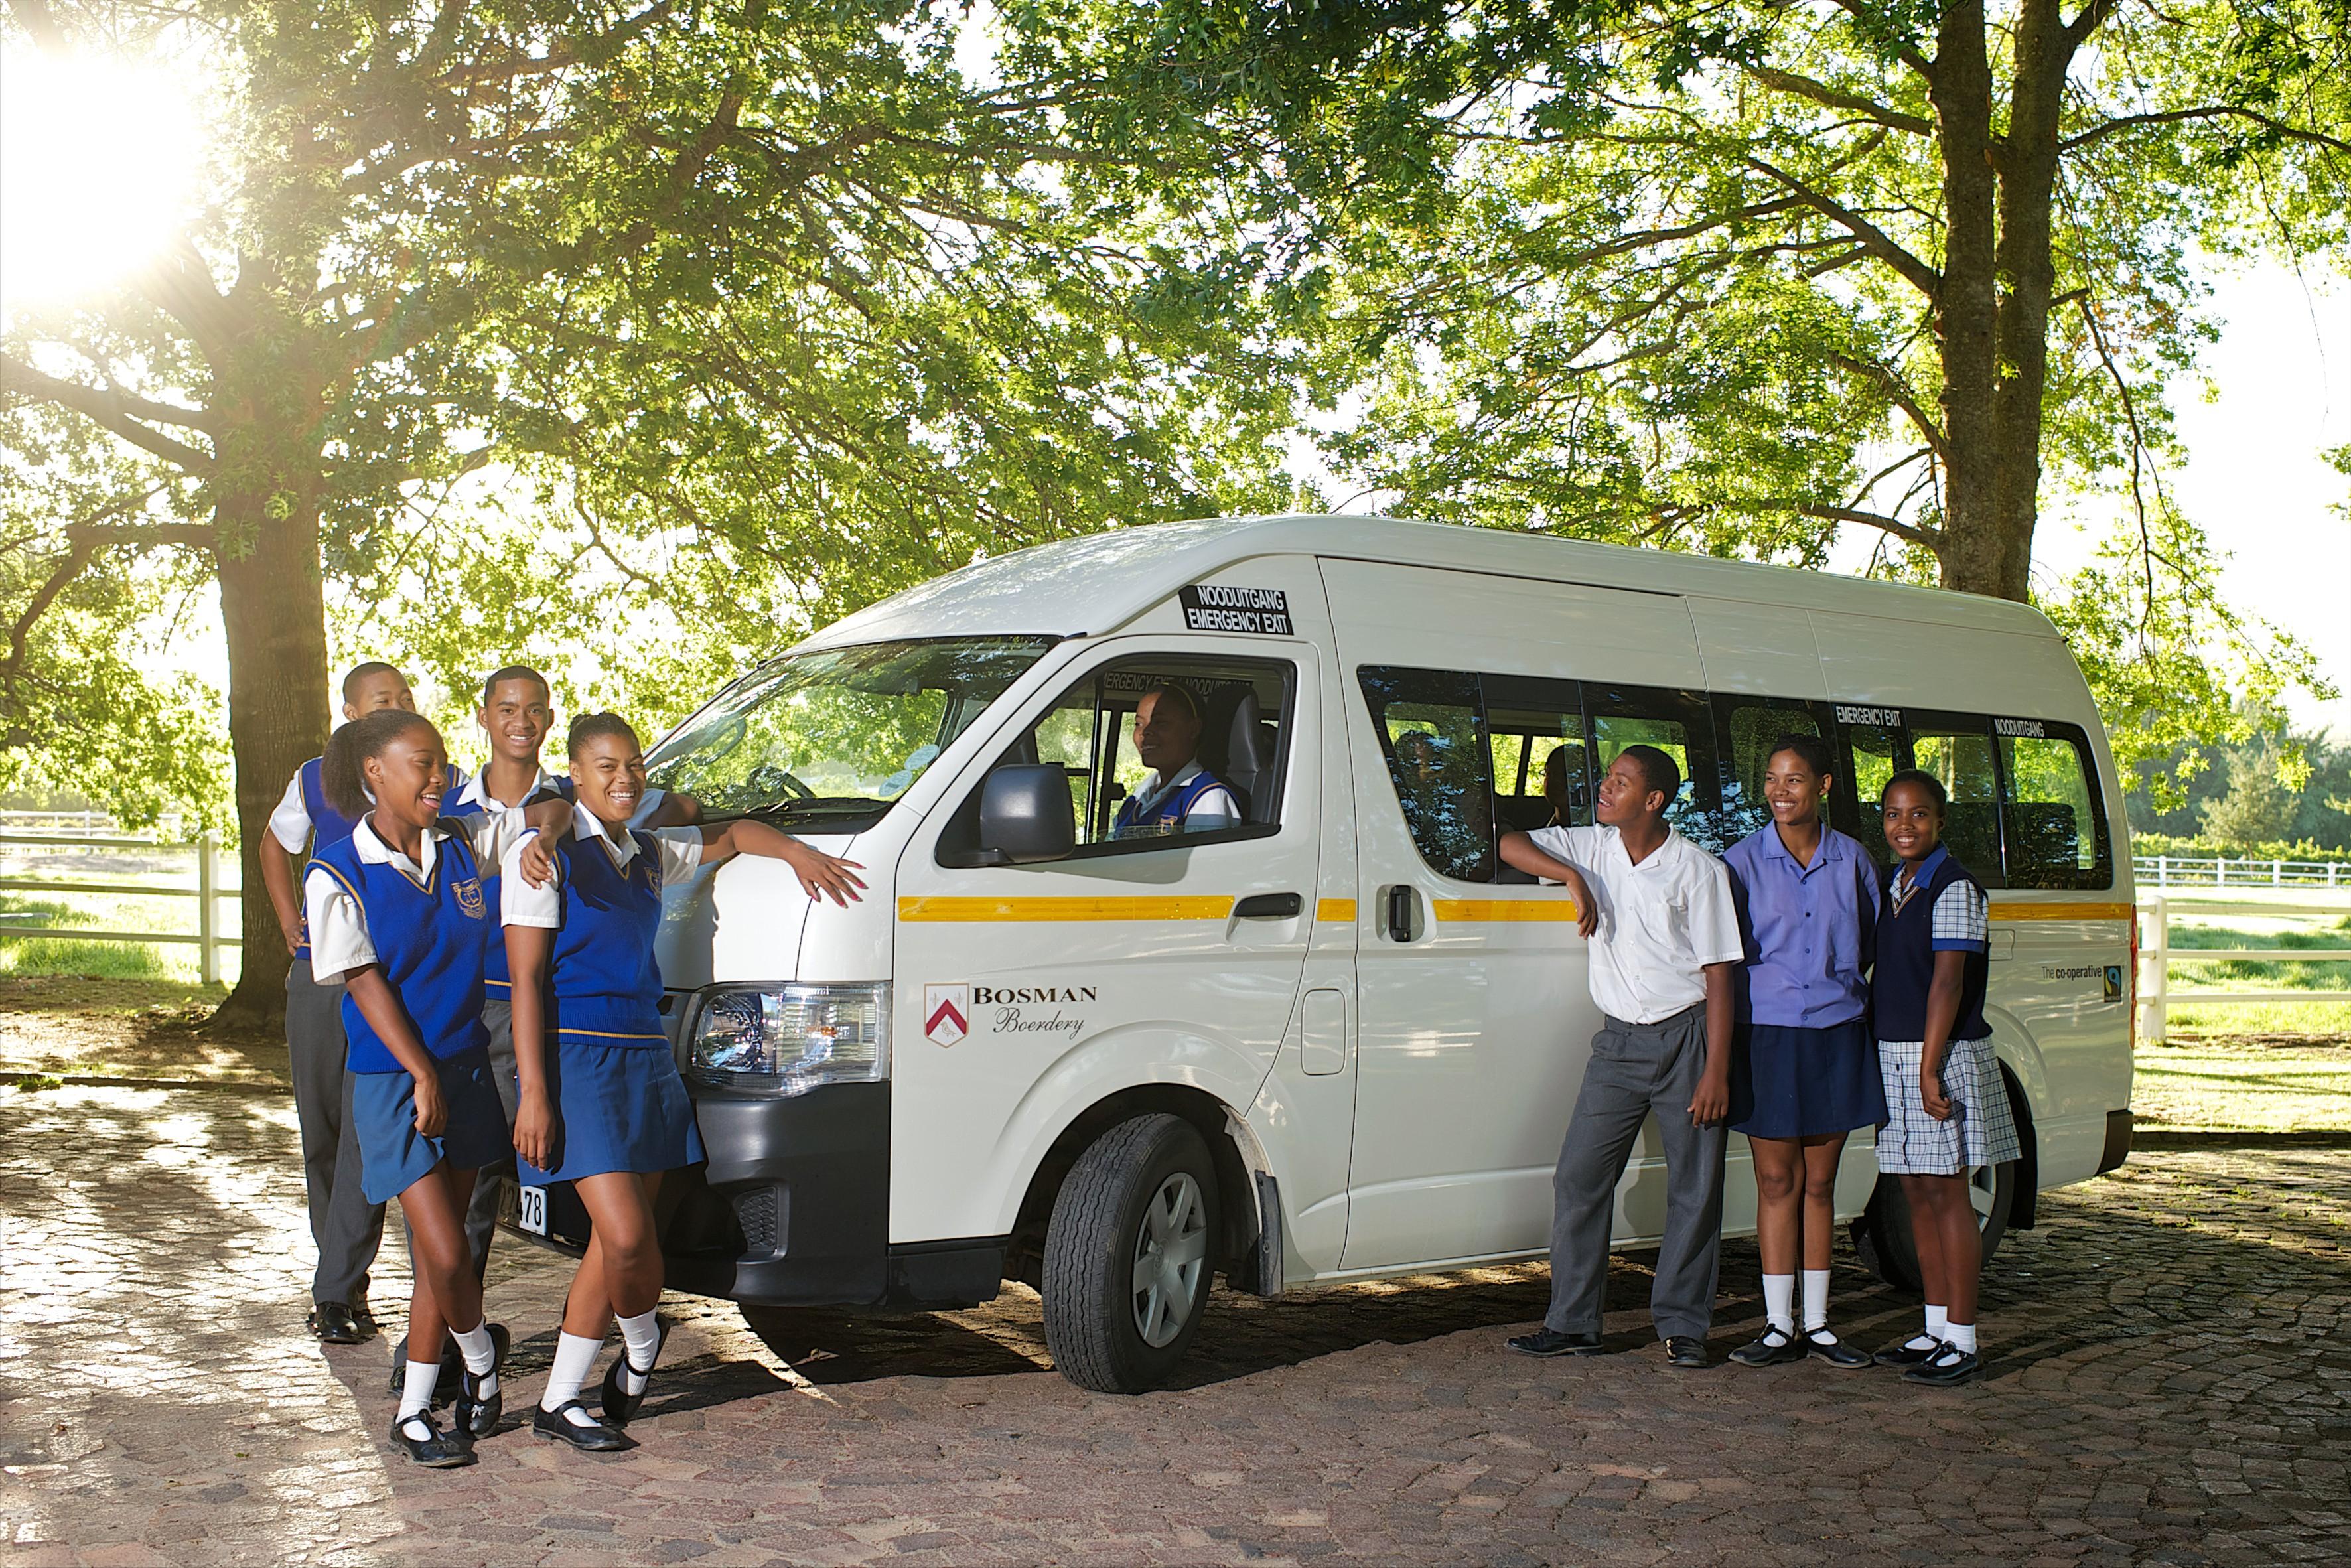 Noordman Wijnimport - Bosman Fairtrade Bus